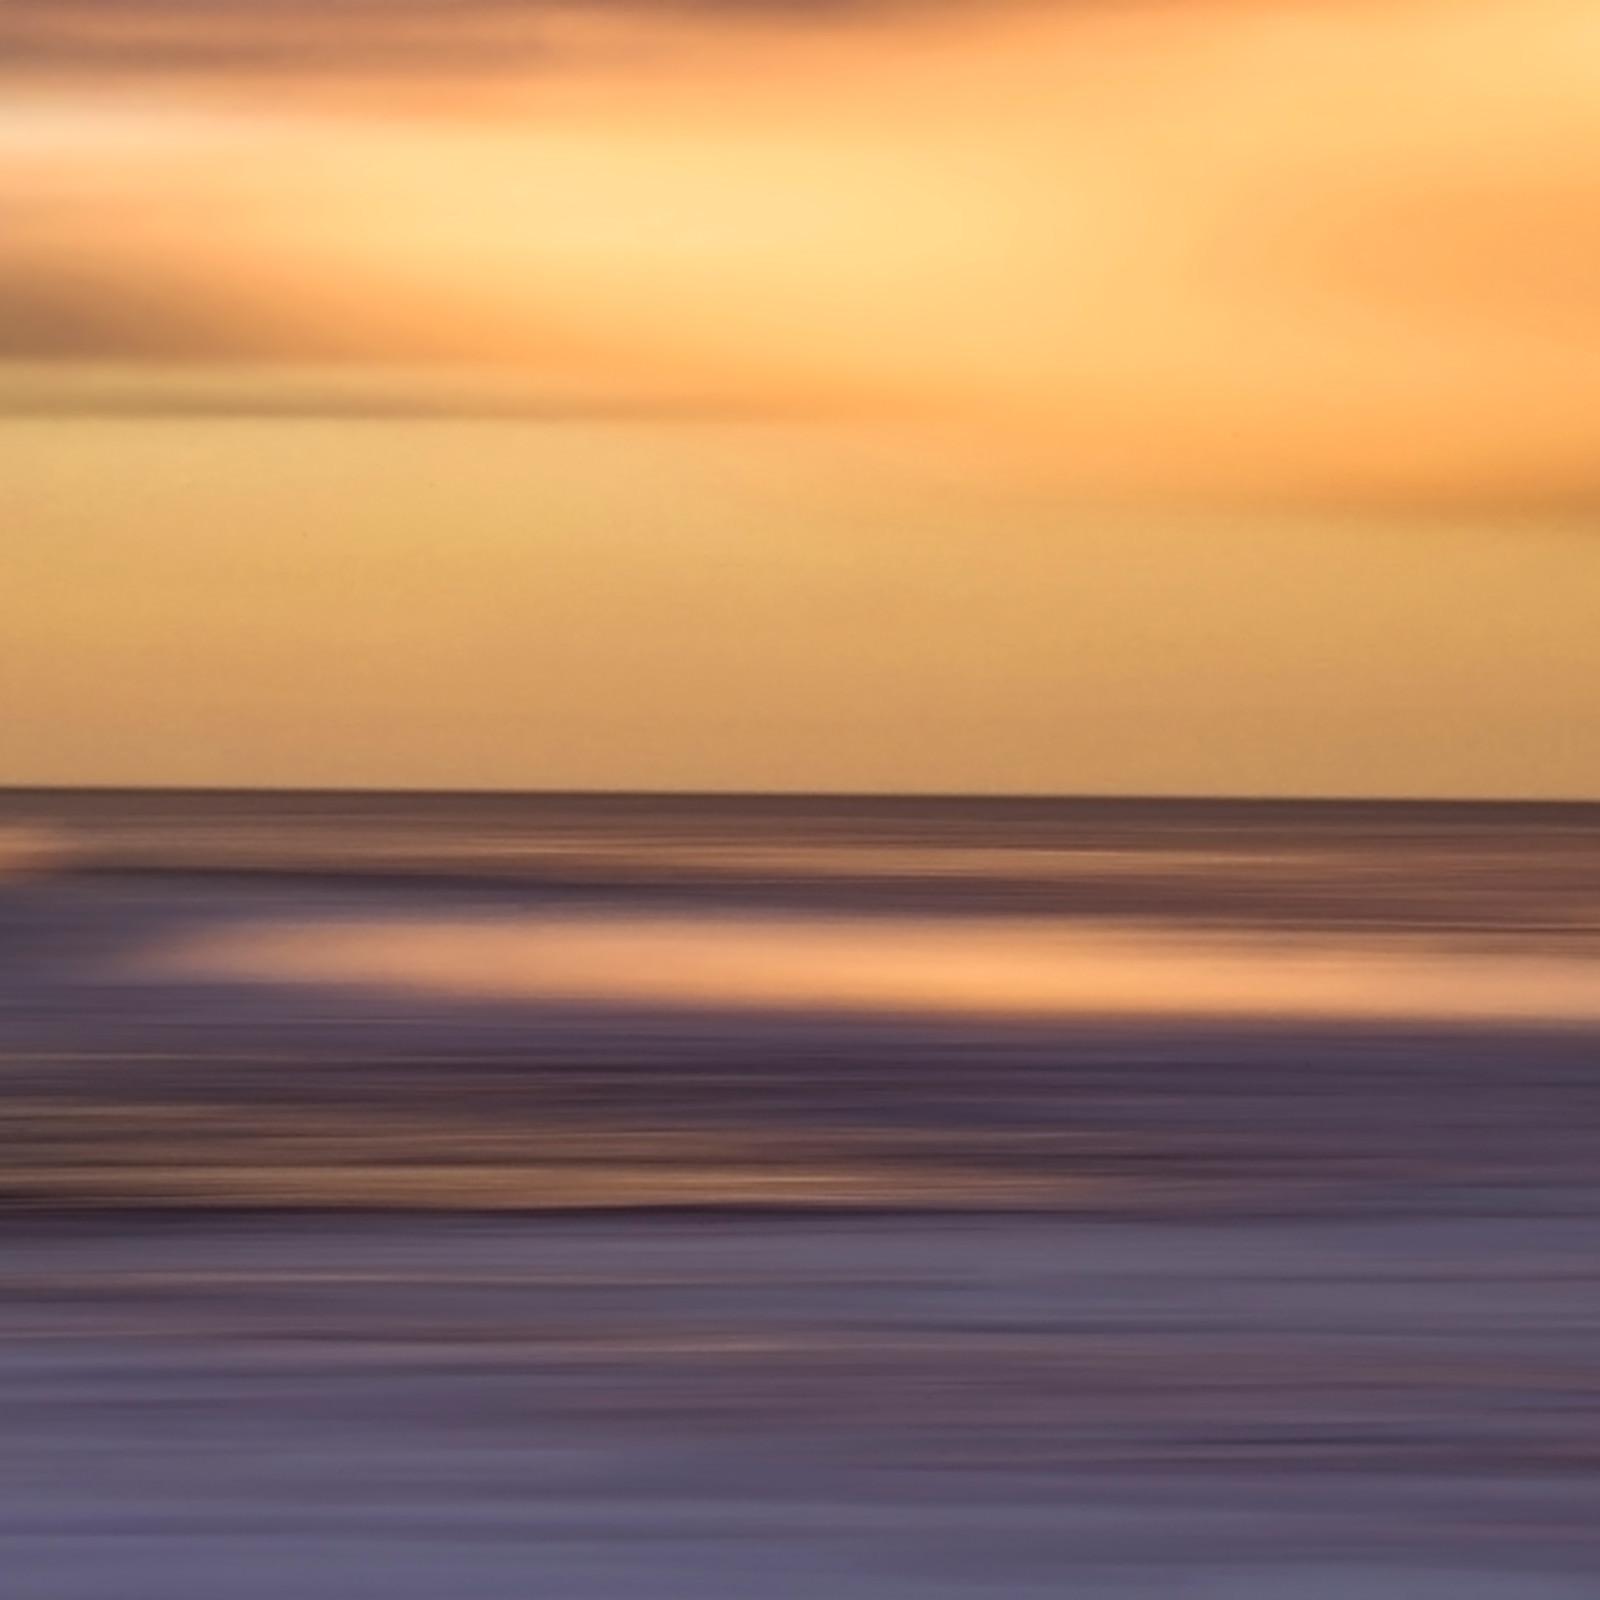 Atlantic abstract orange ryeueu